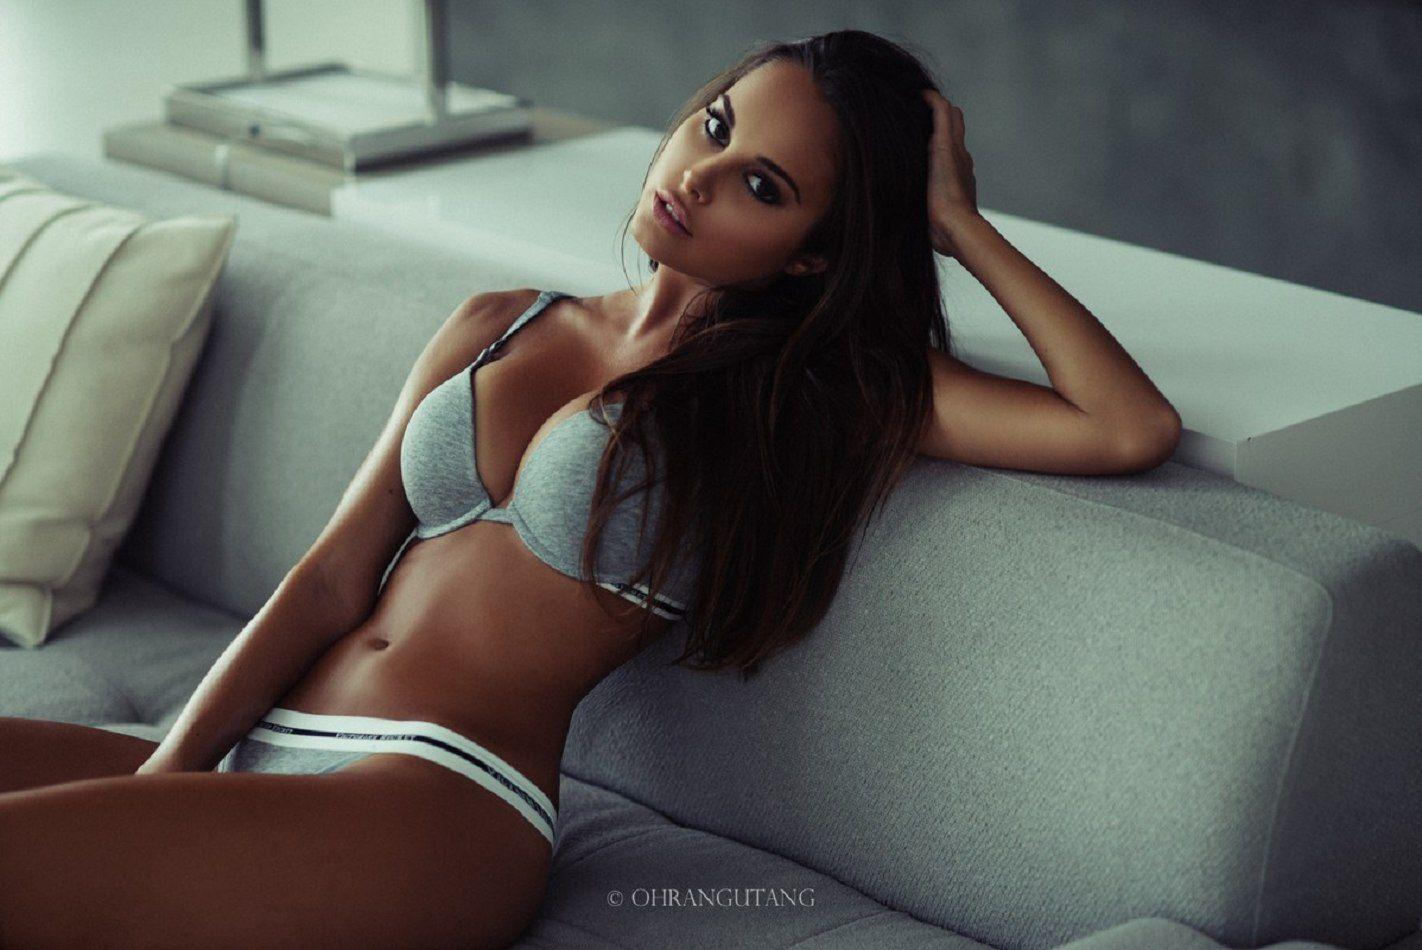 Cleavage Nathalie Darcas naked (37 foto and video), Ass, Bikini, Boobs, underwear 2018